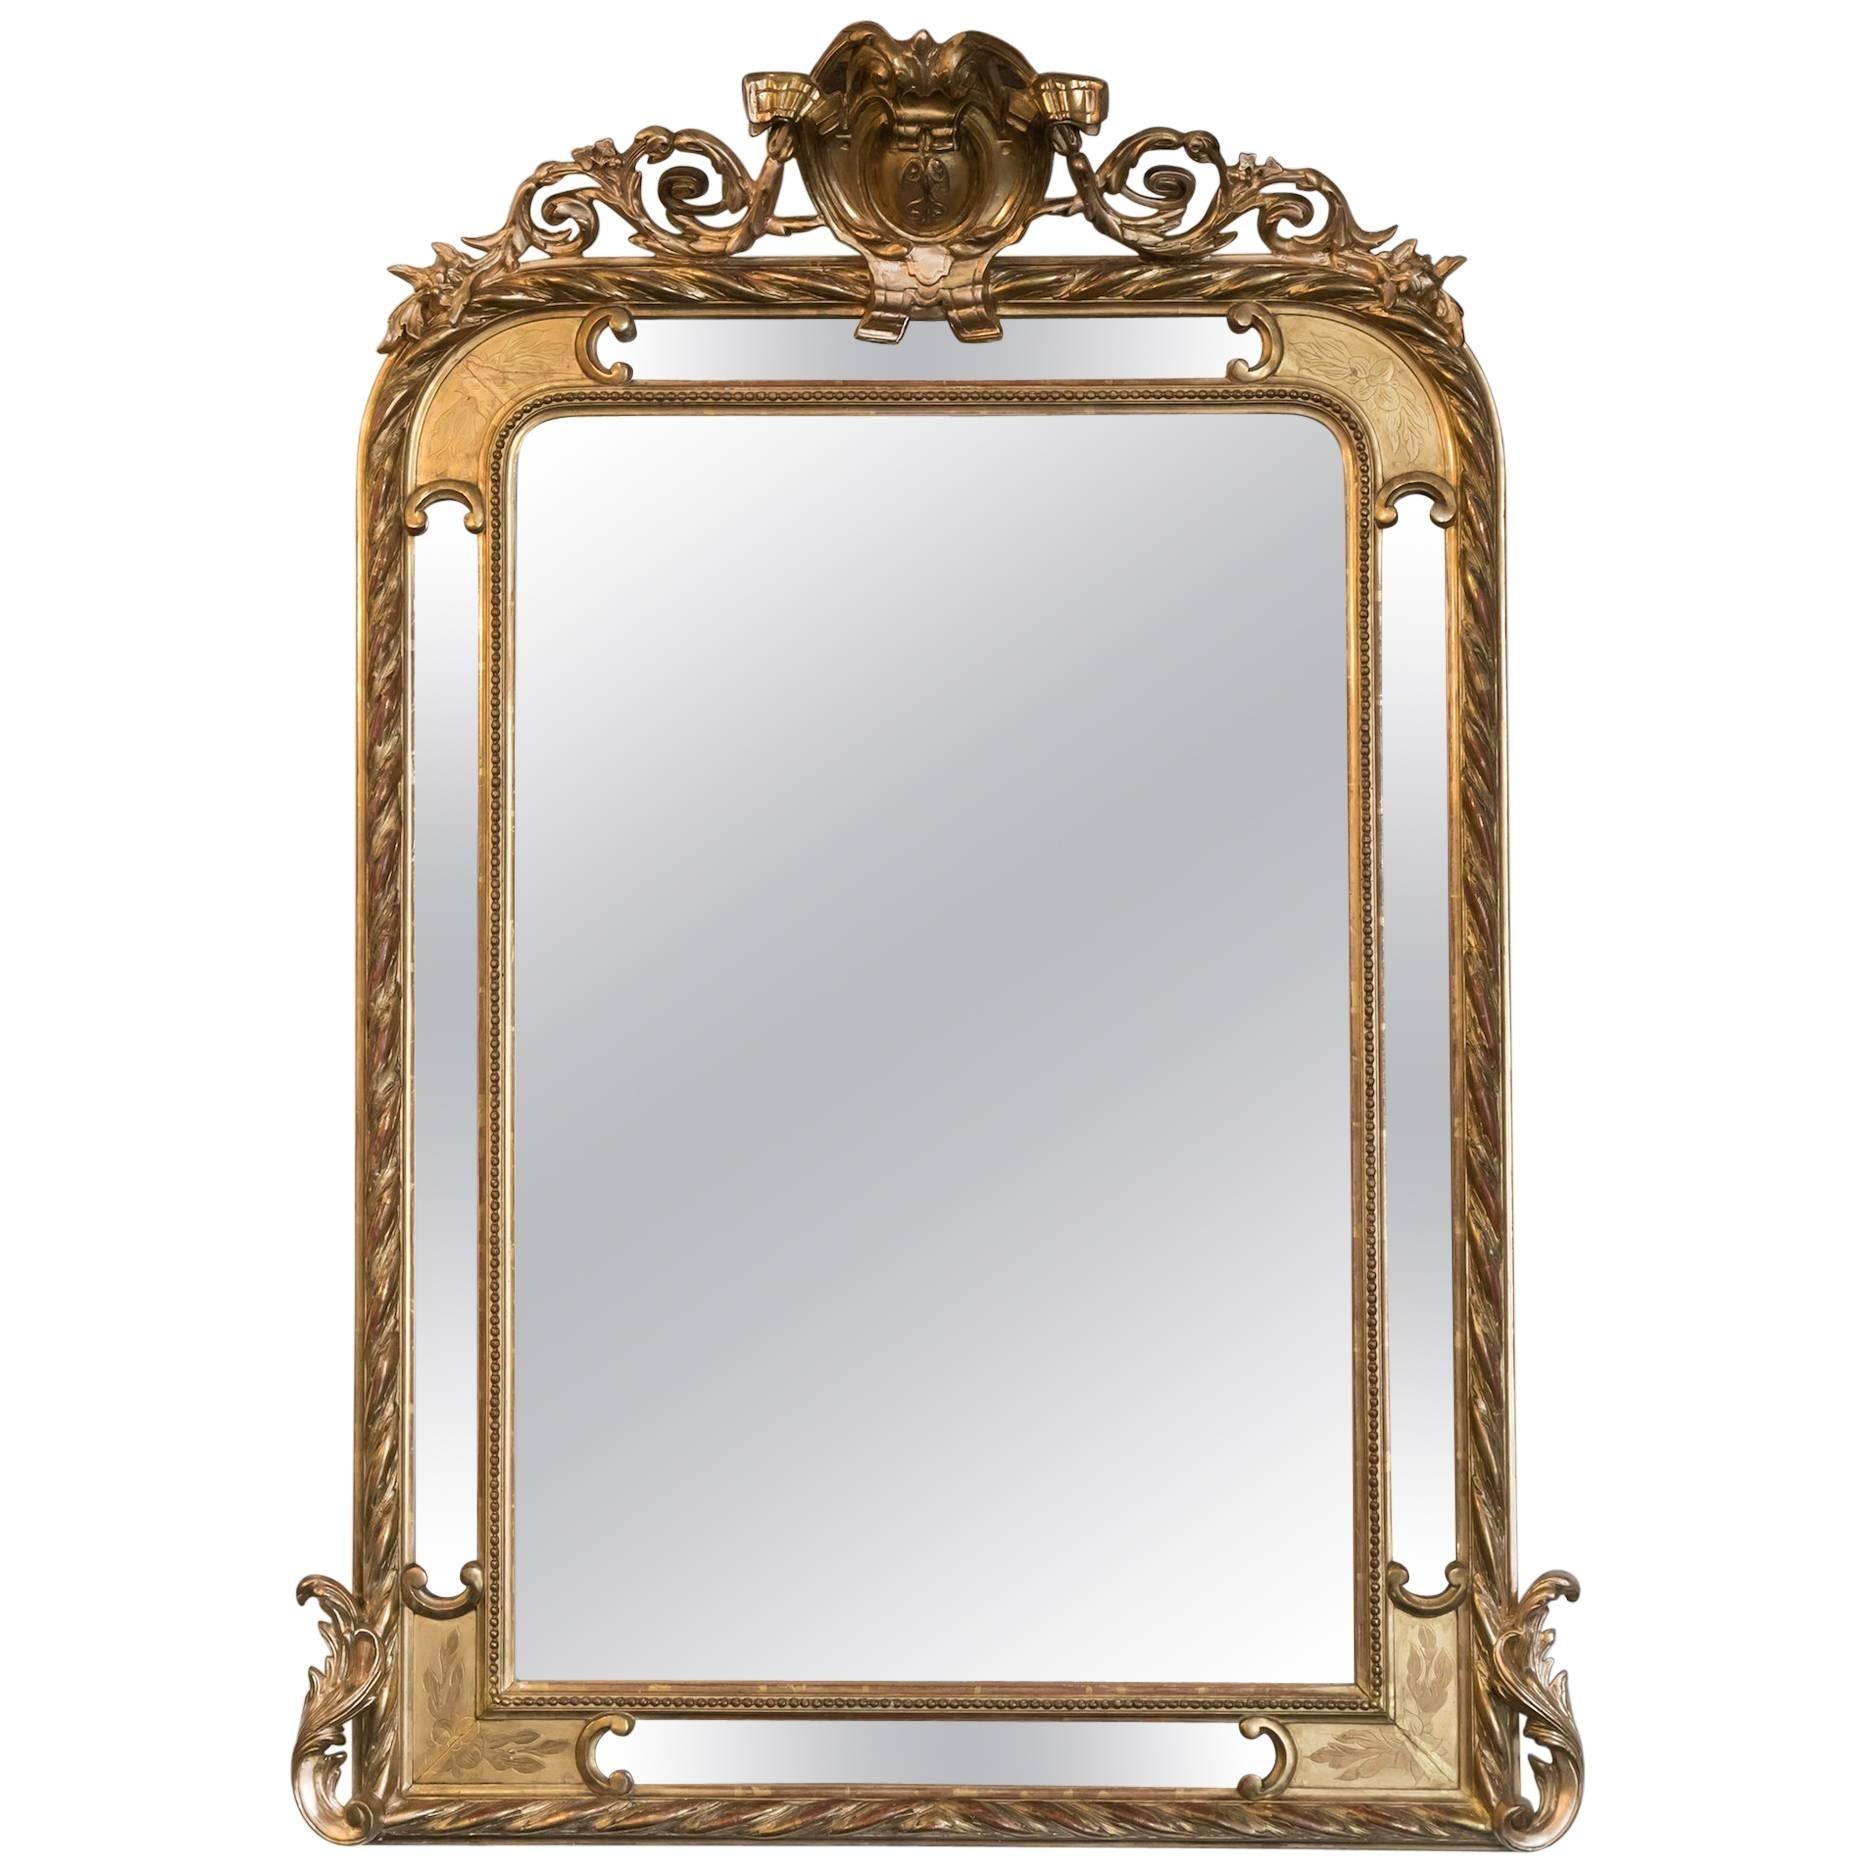 19th Century French Napoleon III Period Giltwood Pareclose Mirror